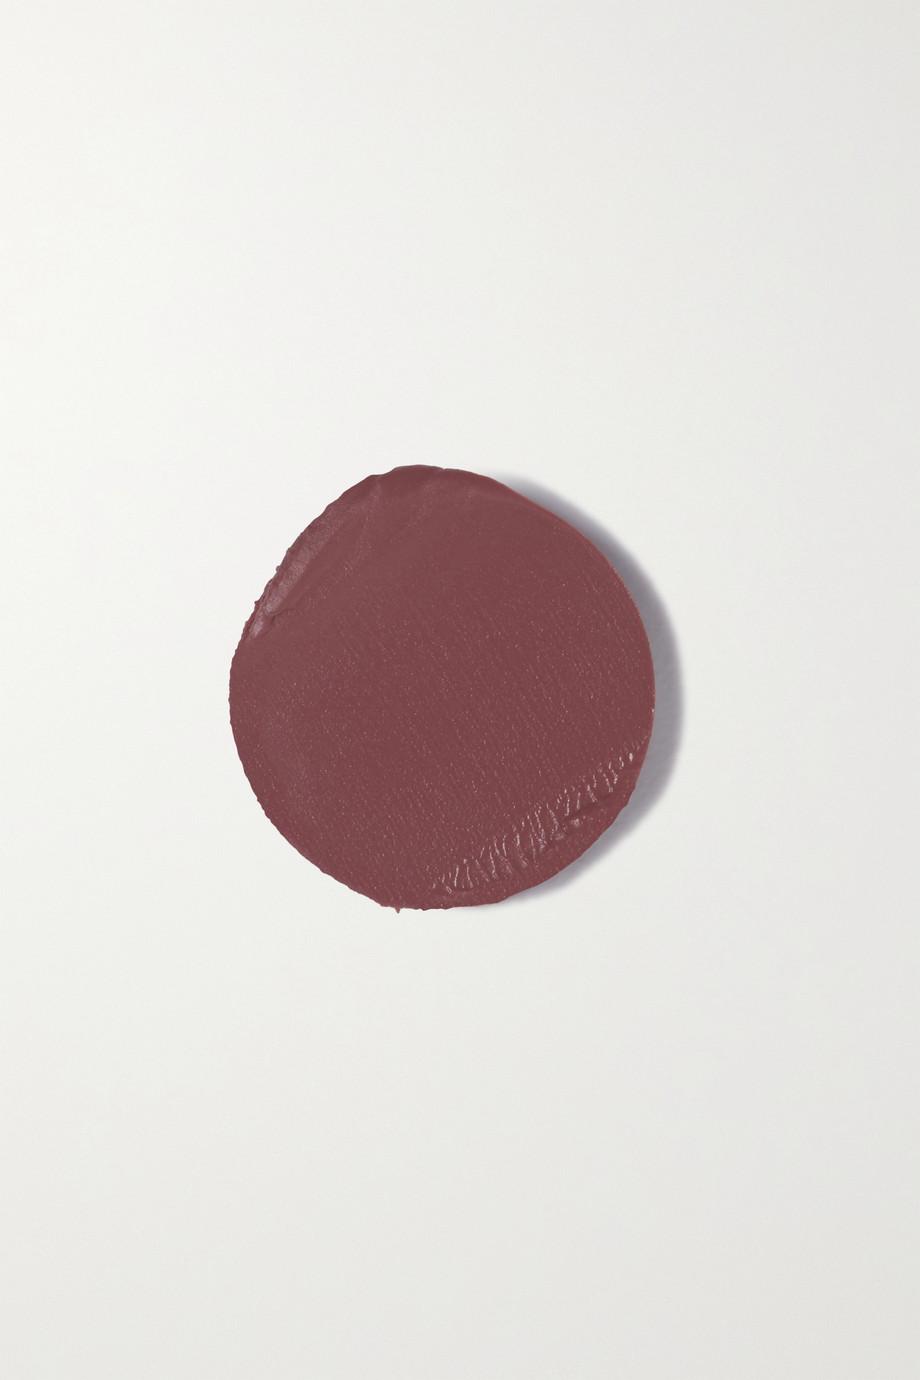 Victoria Beckham Beauty Posh Lipstick – Pose – Lippenstift